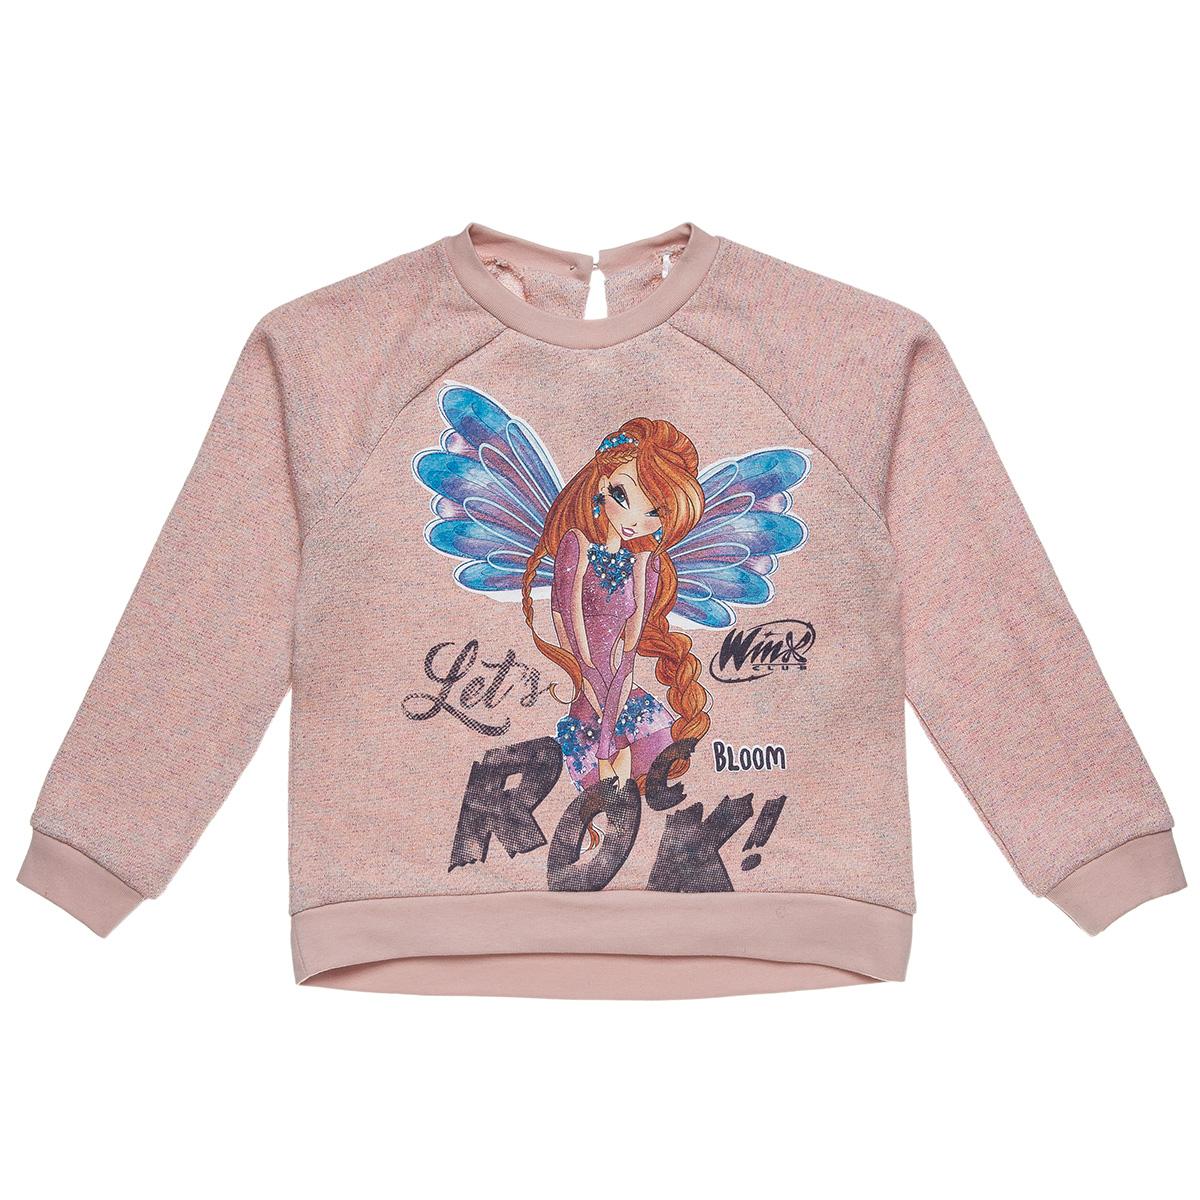 d90b23cd844 Μπλούζα Winx με τύπωμα Bloom (Κορίτσι 6-10 ετών) 00121321 - Σομόν -